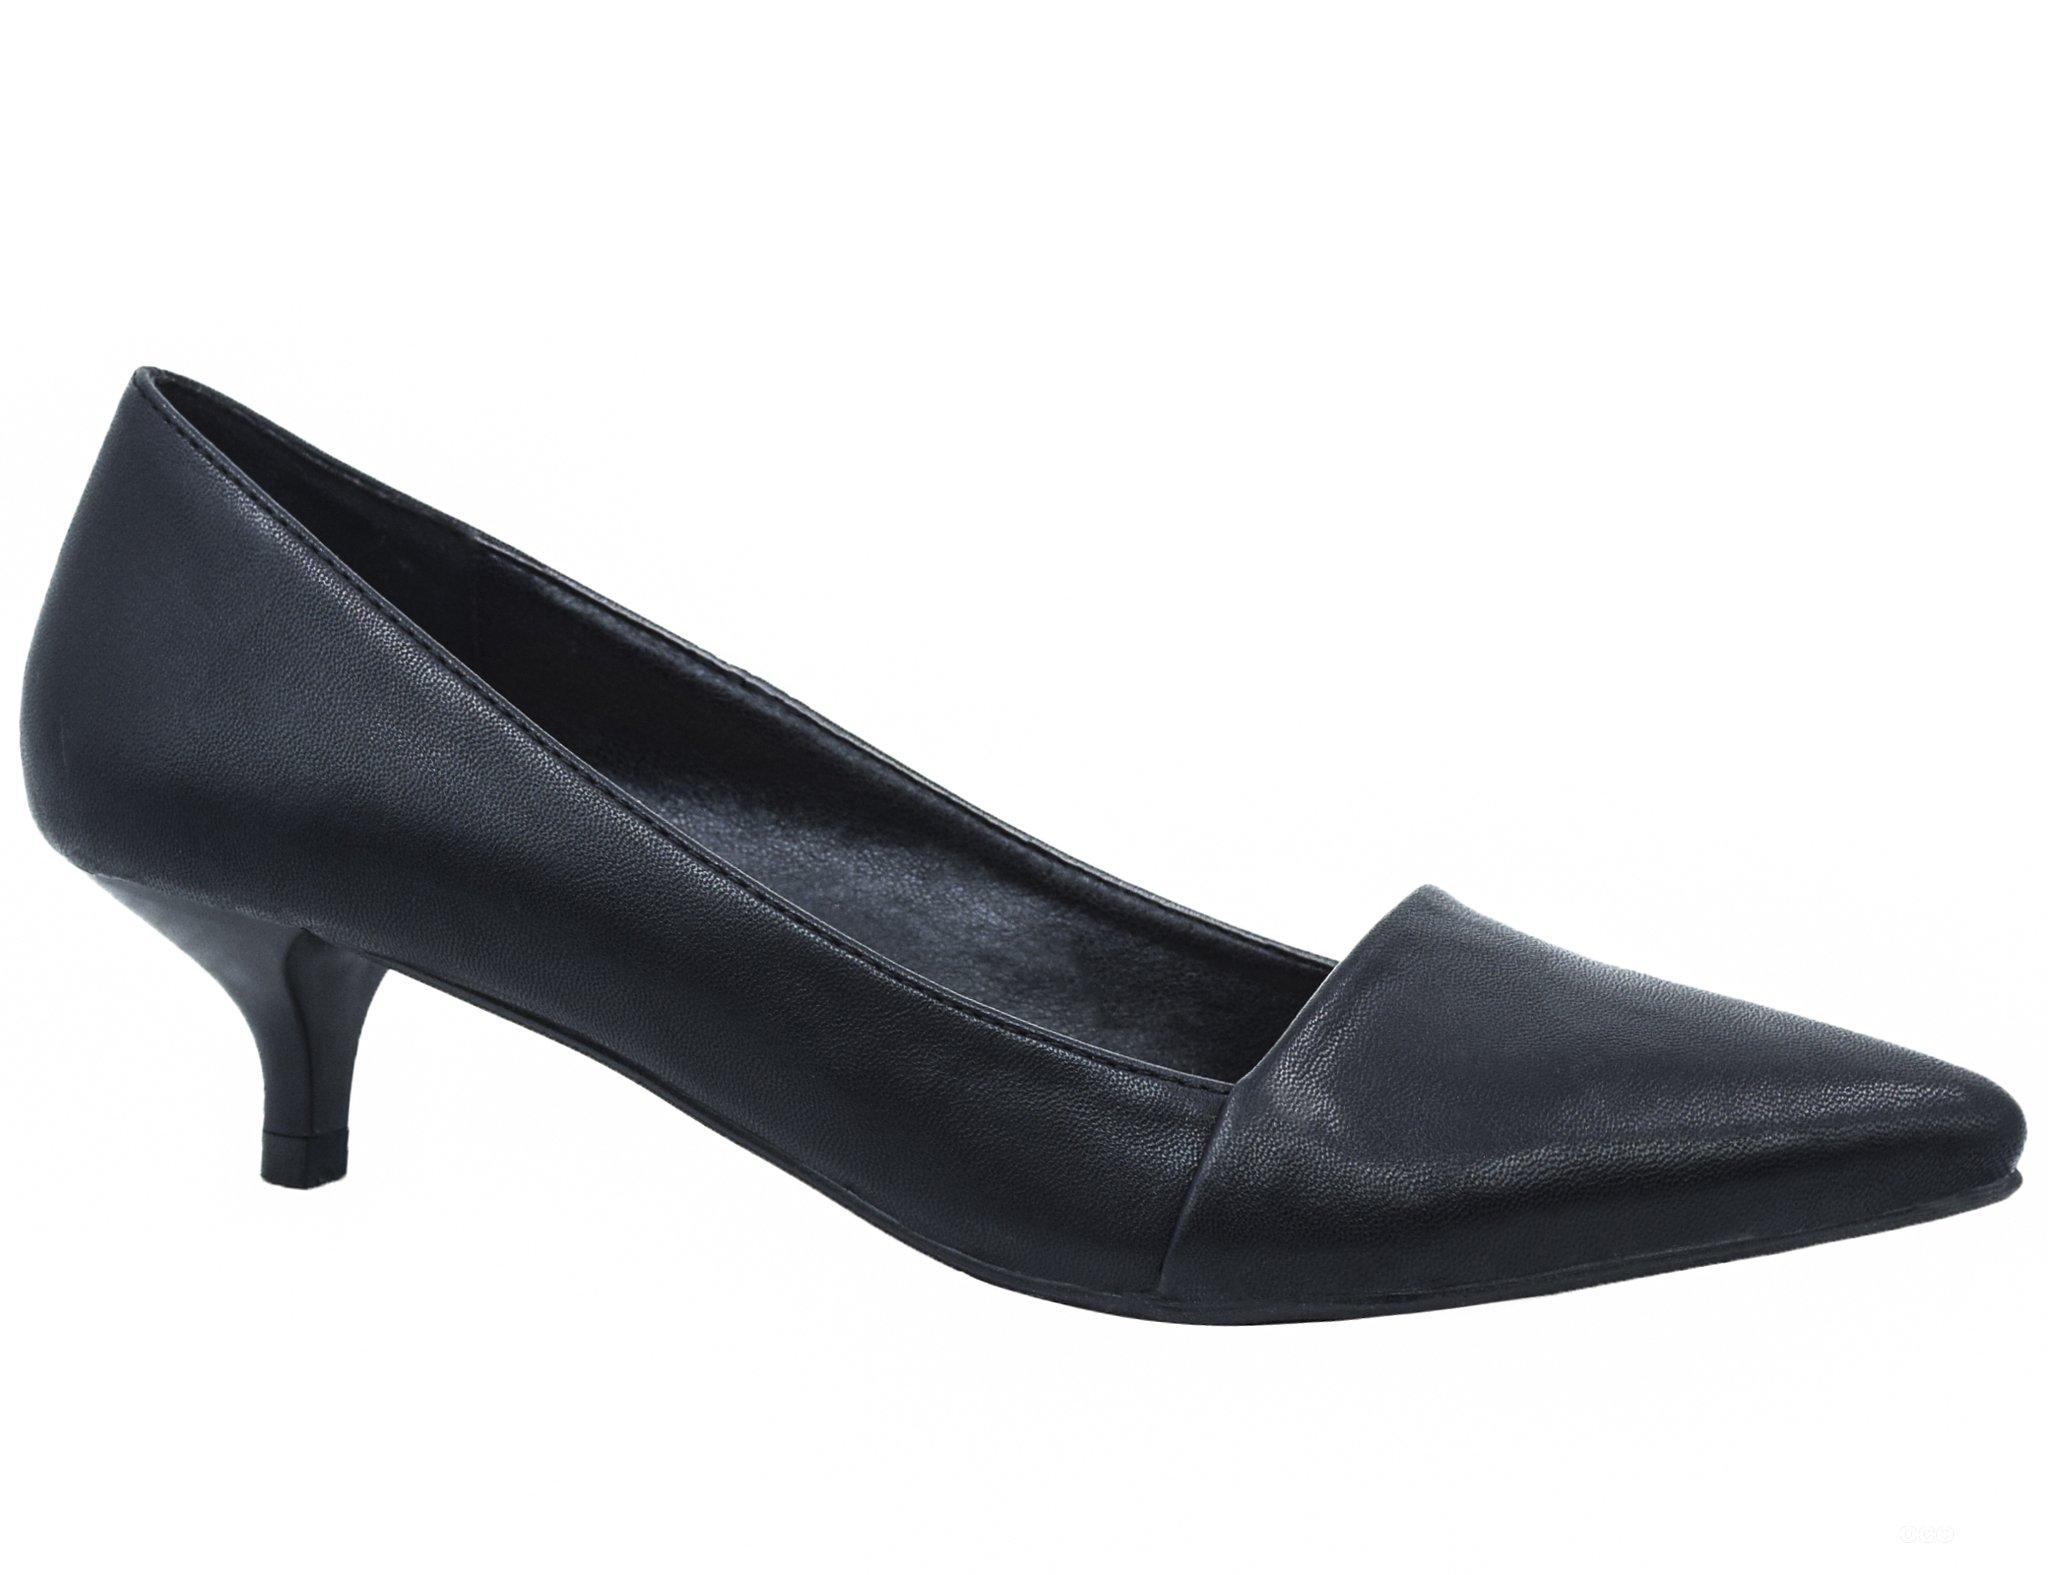 Greatonu Womens Black Comfortable Kitten Mid Low Heel Closed Toe Dress Pump Court Shoes Size 10 US/41 EU